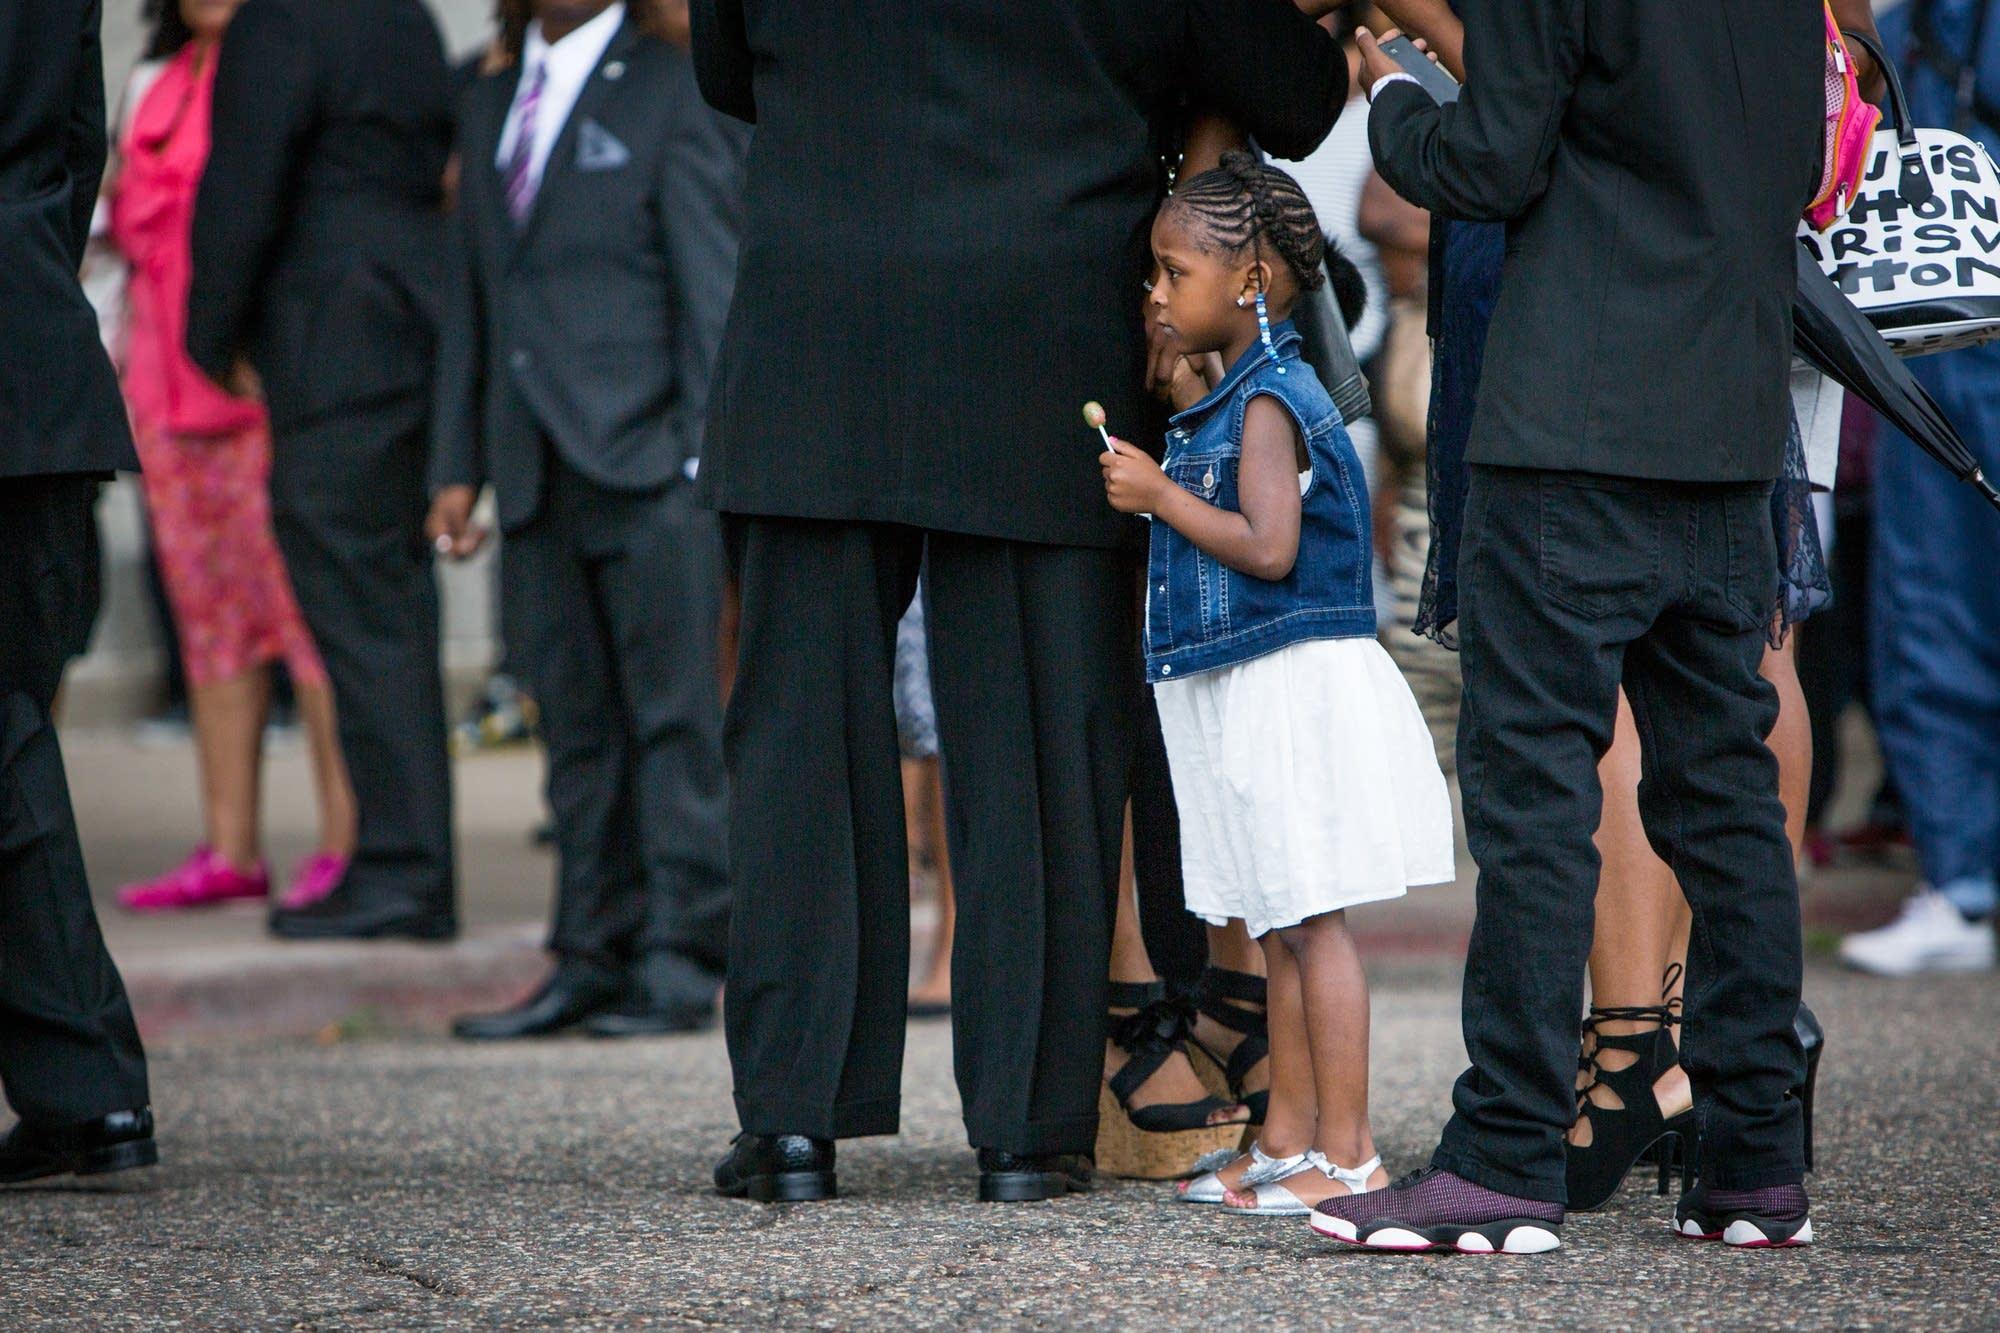 Diamond Reynolds' daughter holds her hand